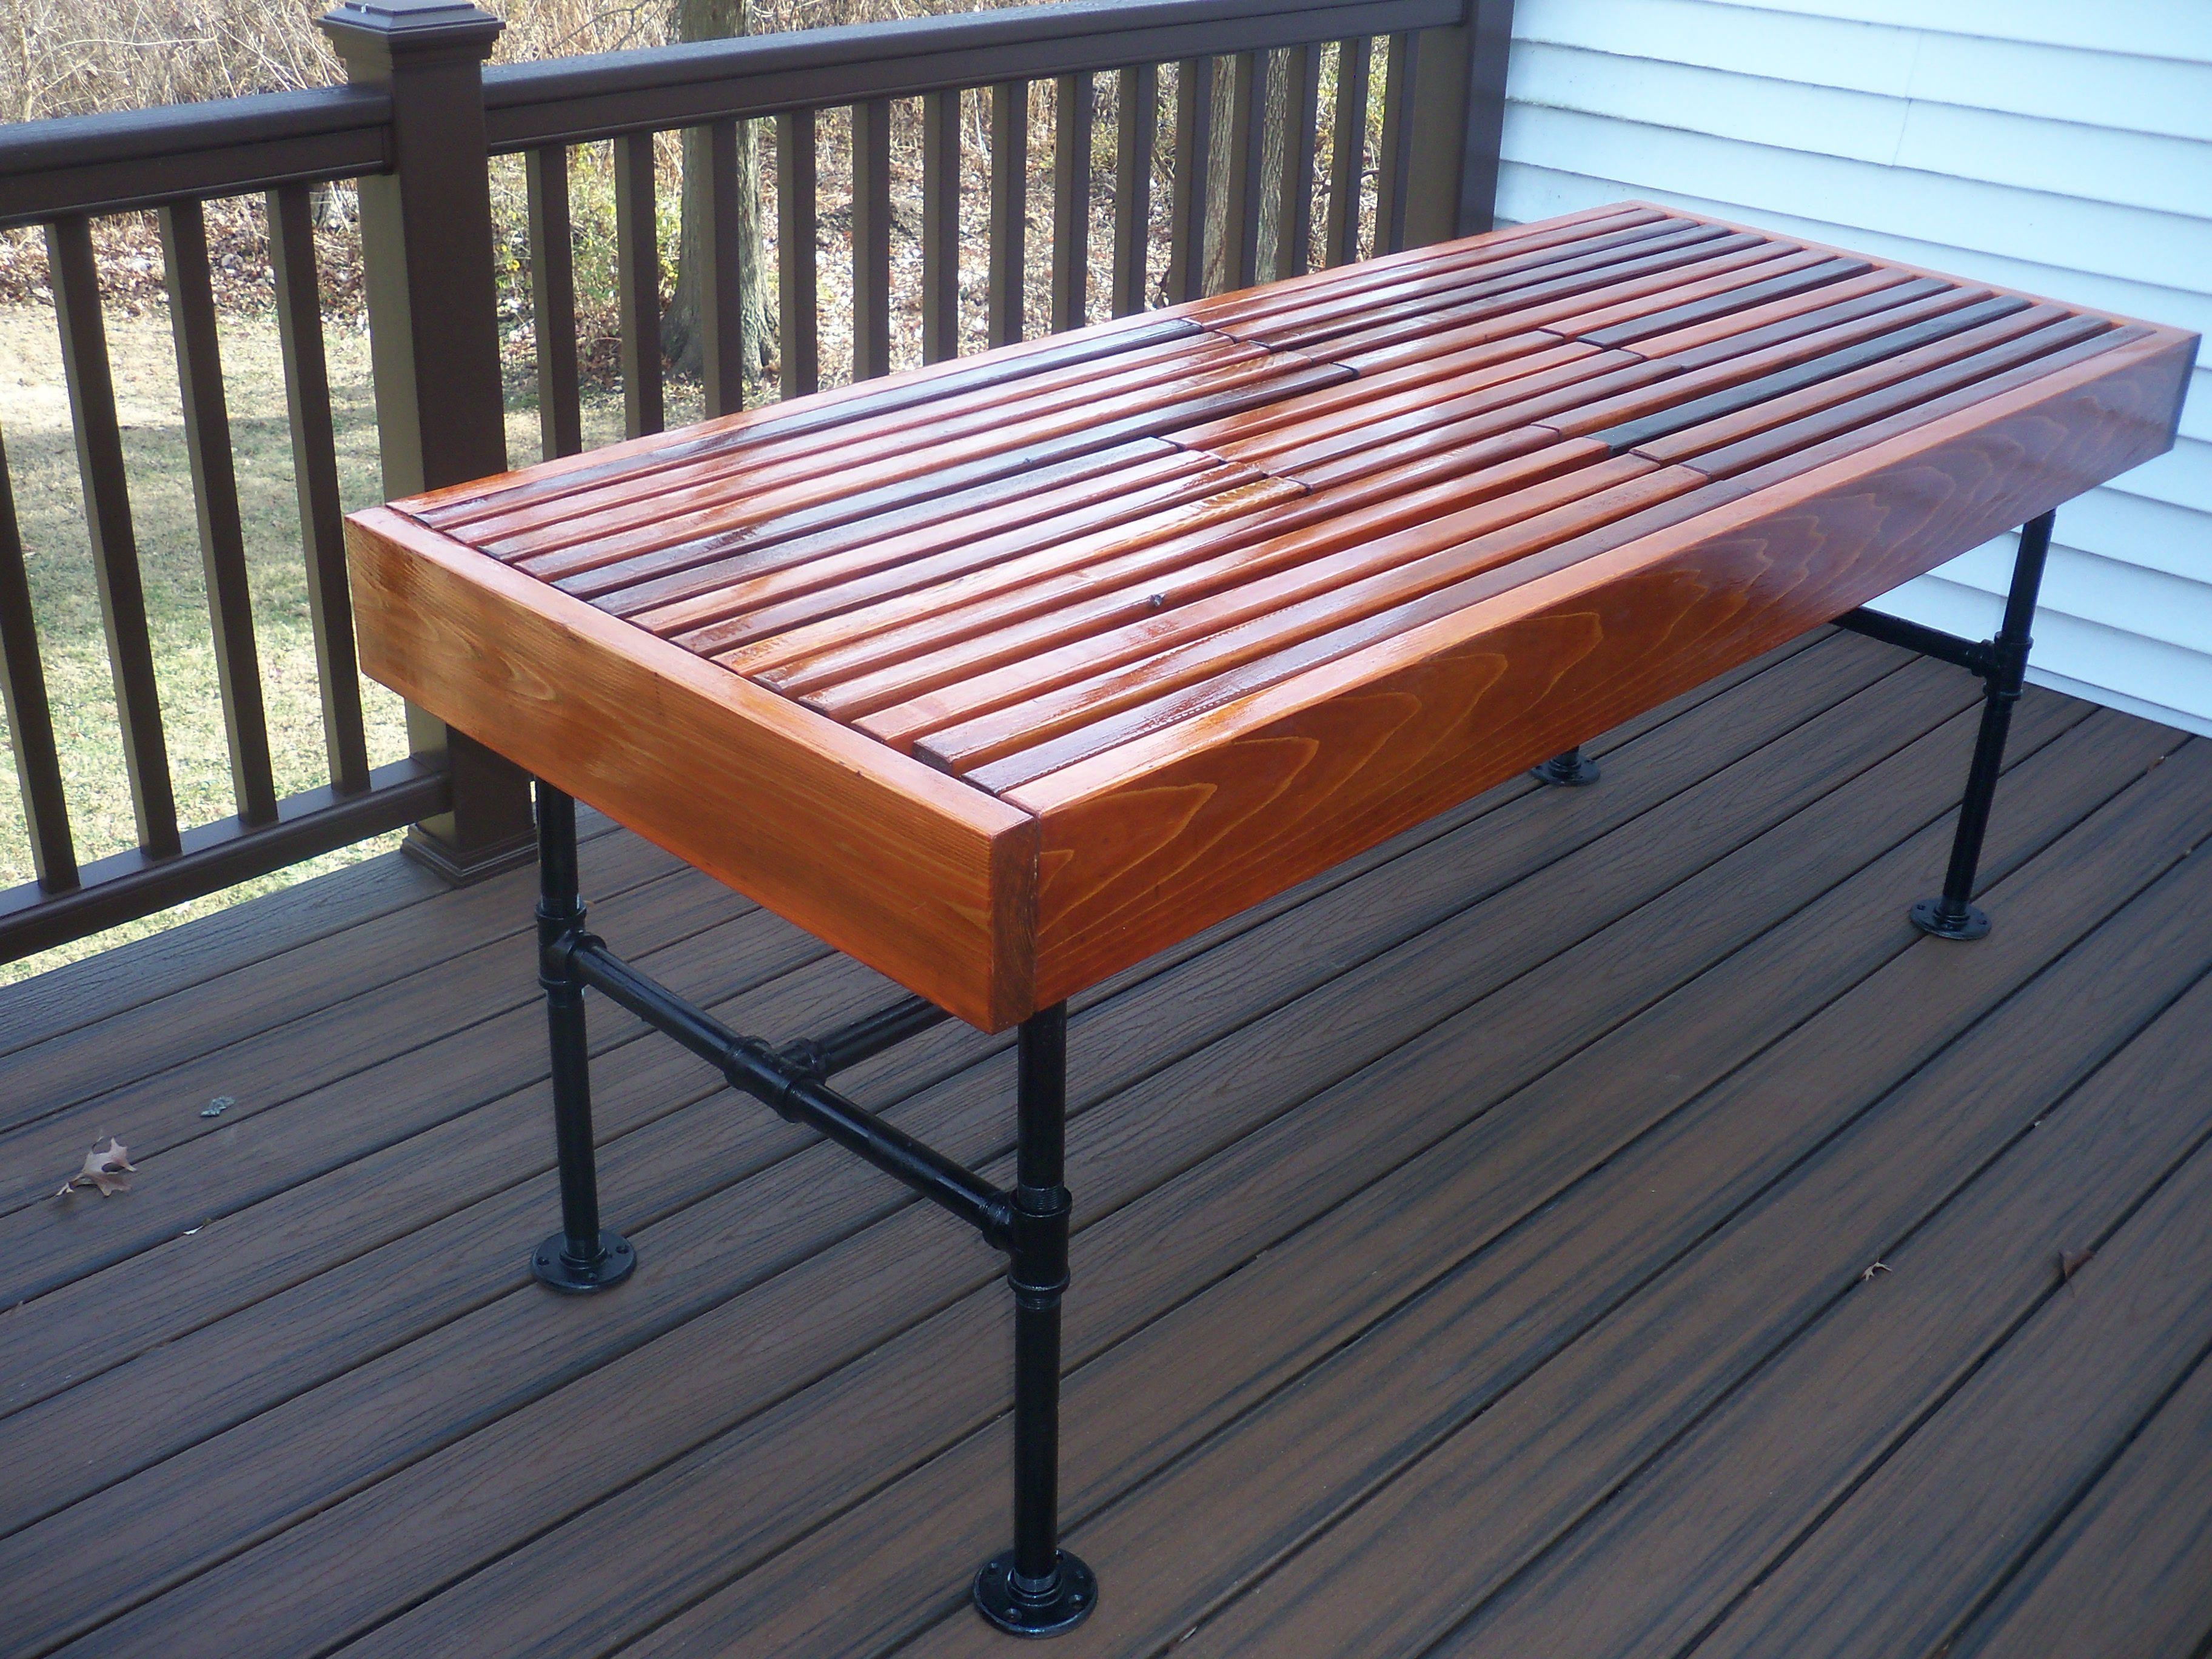 Pin on DIY Cedar outdoor table with builtin wine & beer